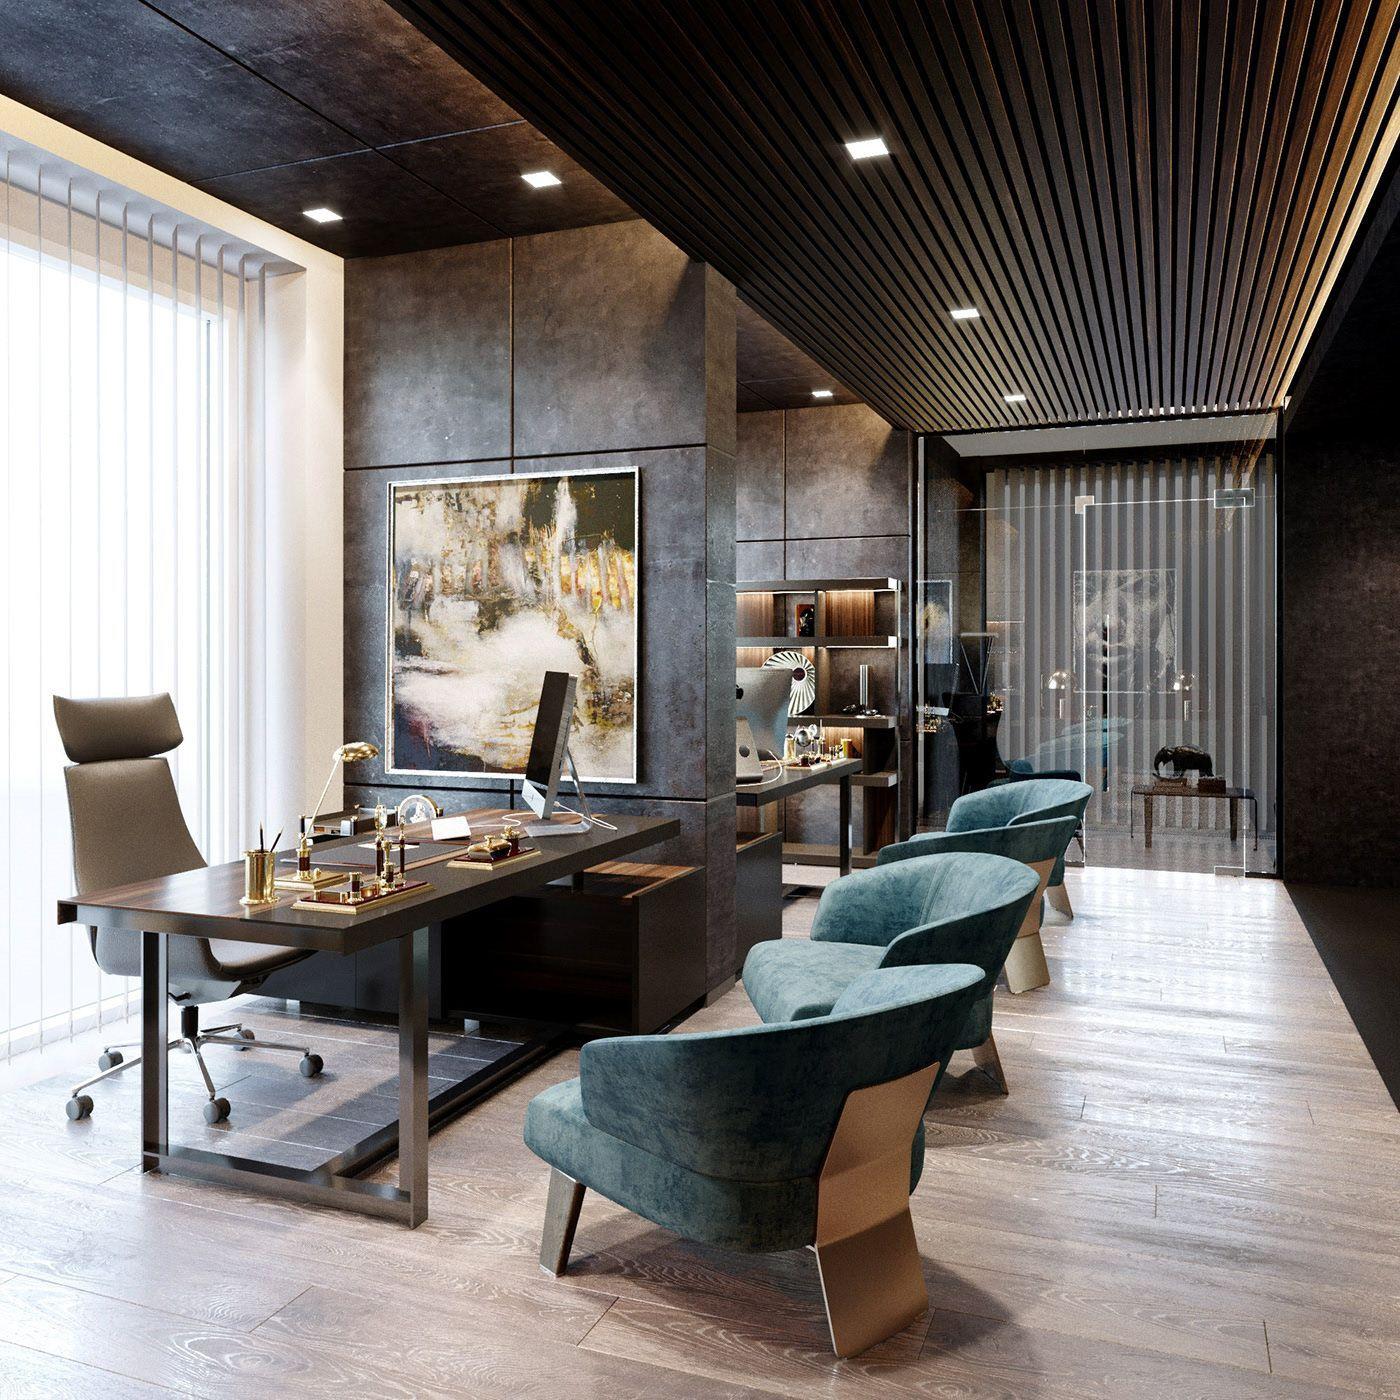 Office Concept Office Concept On Behance #Concept #Office